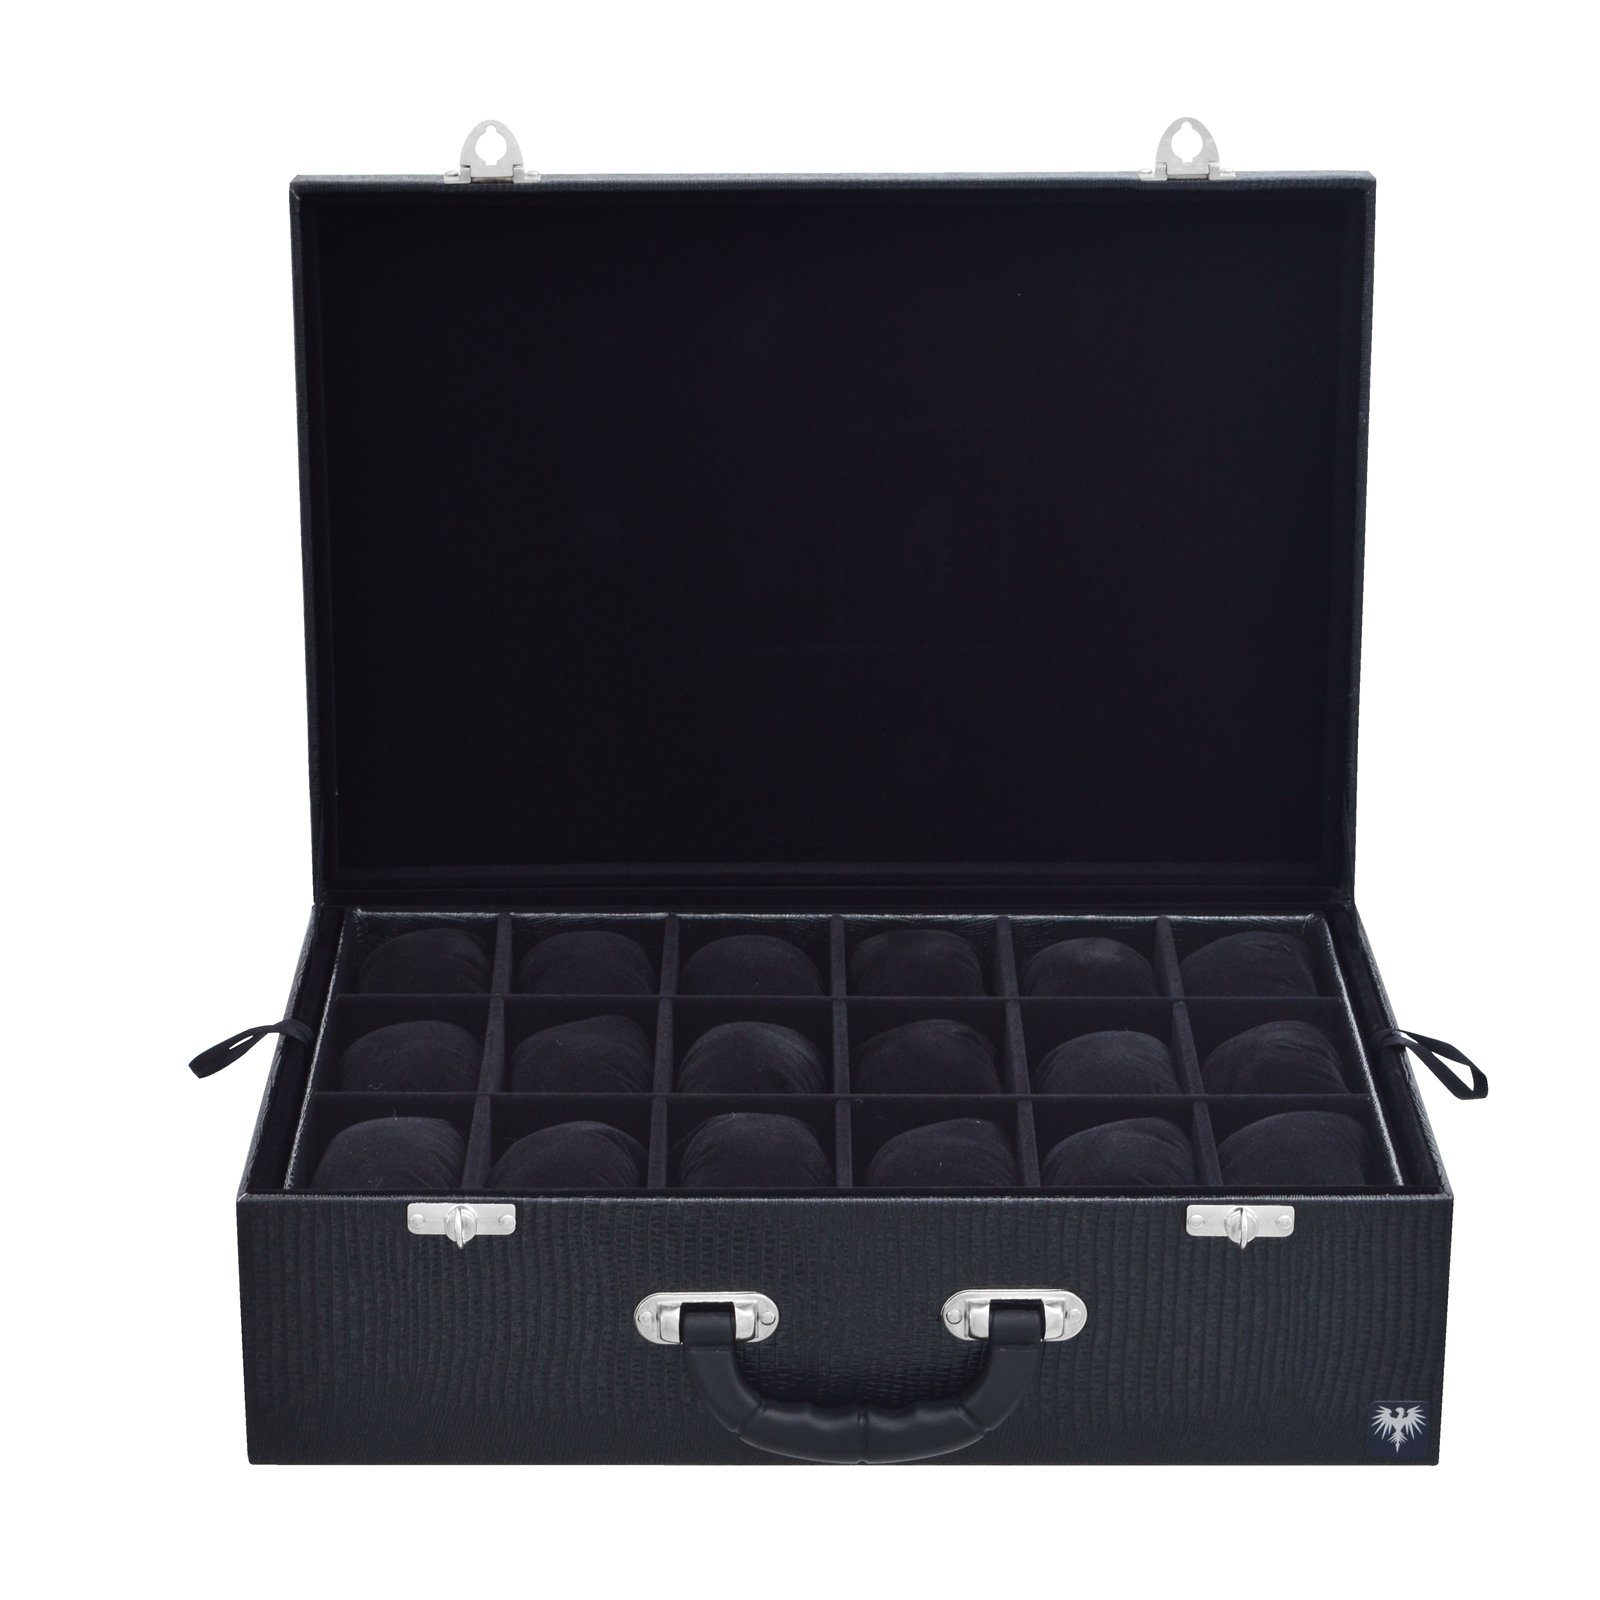 maleta-porta-relogio-36-nichos-couro-ecologico-preto-preto-imagem-6.JPG